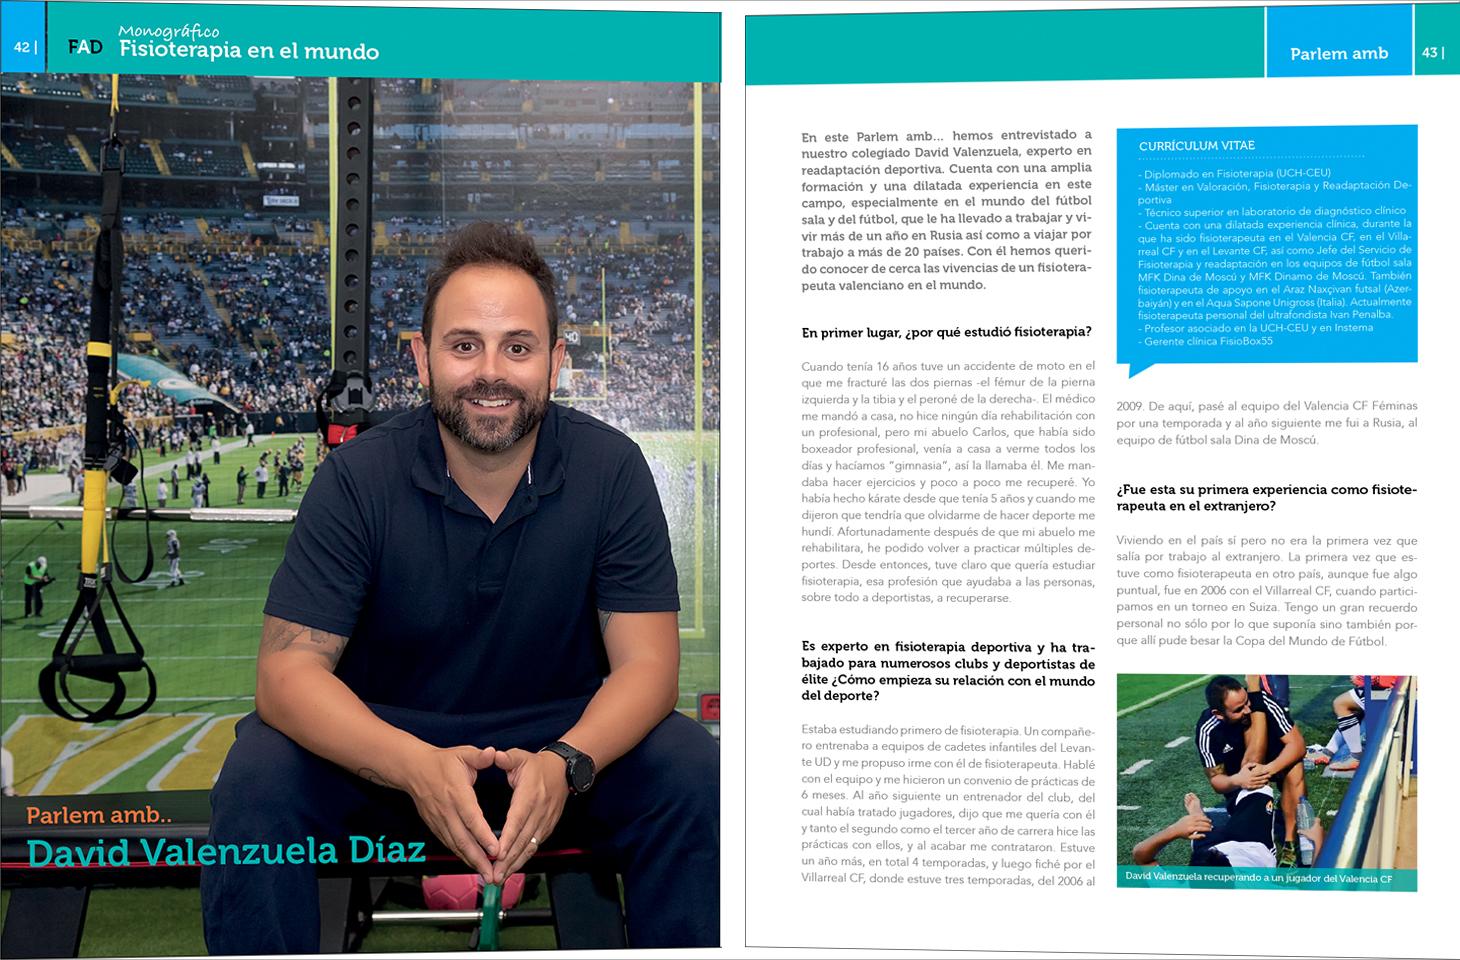 Parlem amb... David Valenzuela. Entrevista del especial de Fisioterapia en el mundo